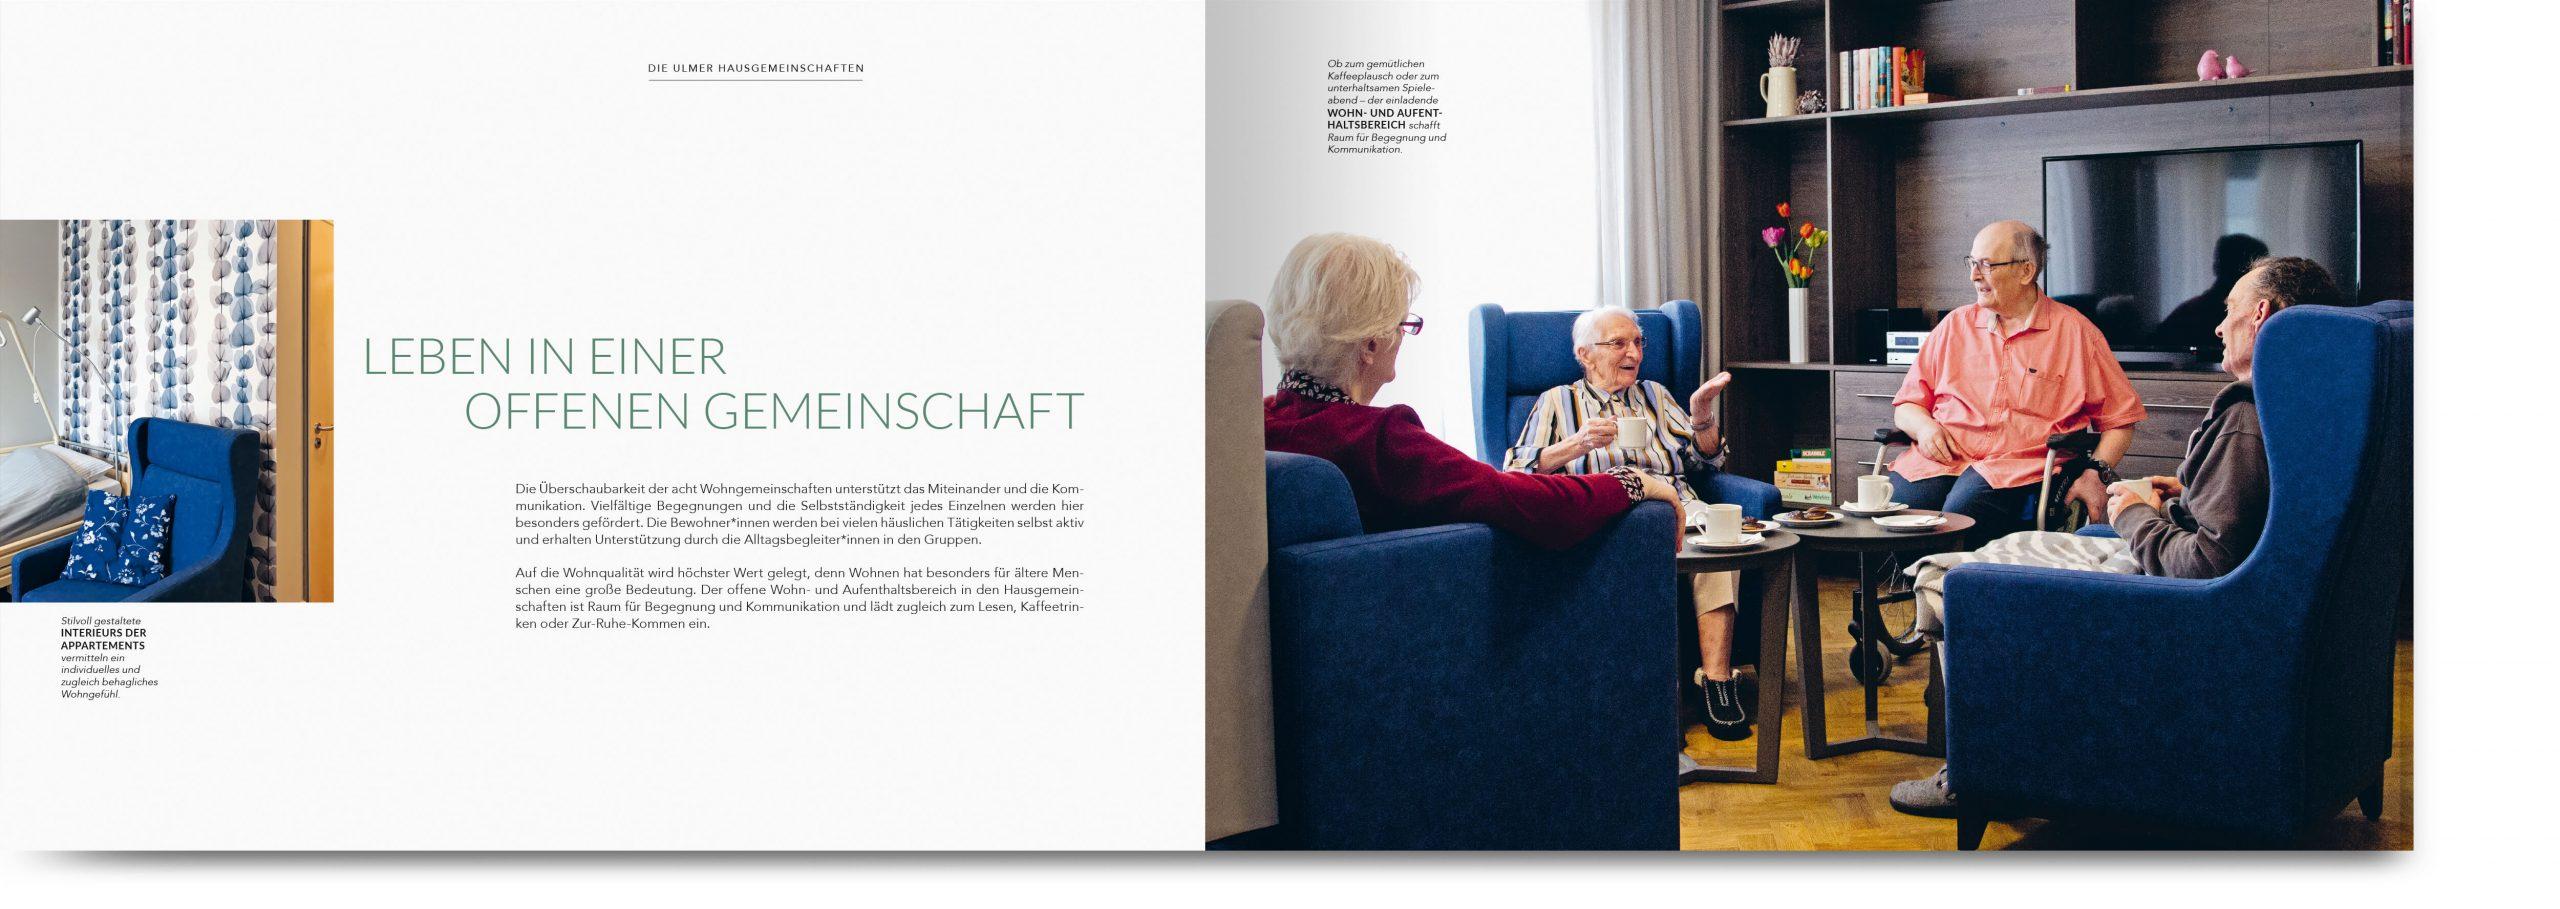 fh-web-asb-broschüren-ulm-4-scaled.jpg